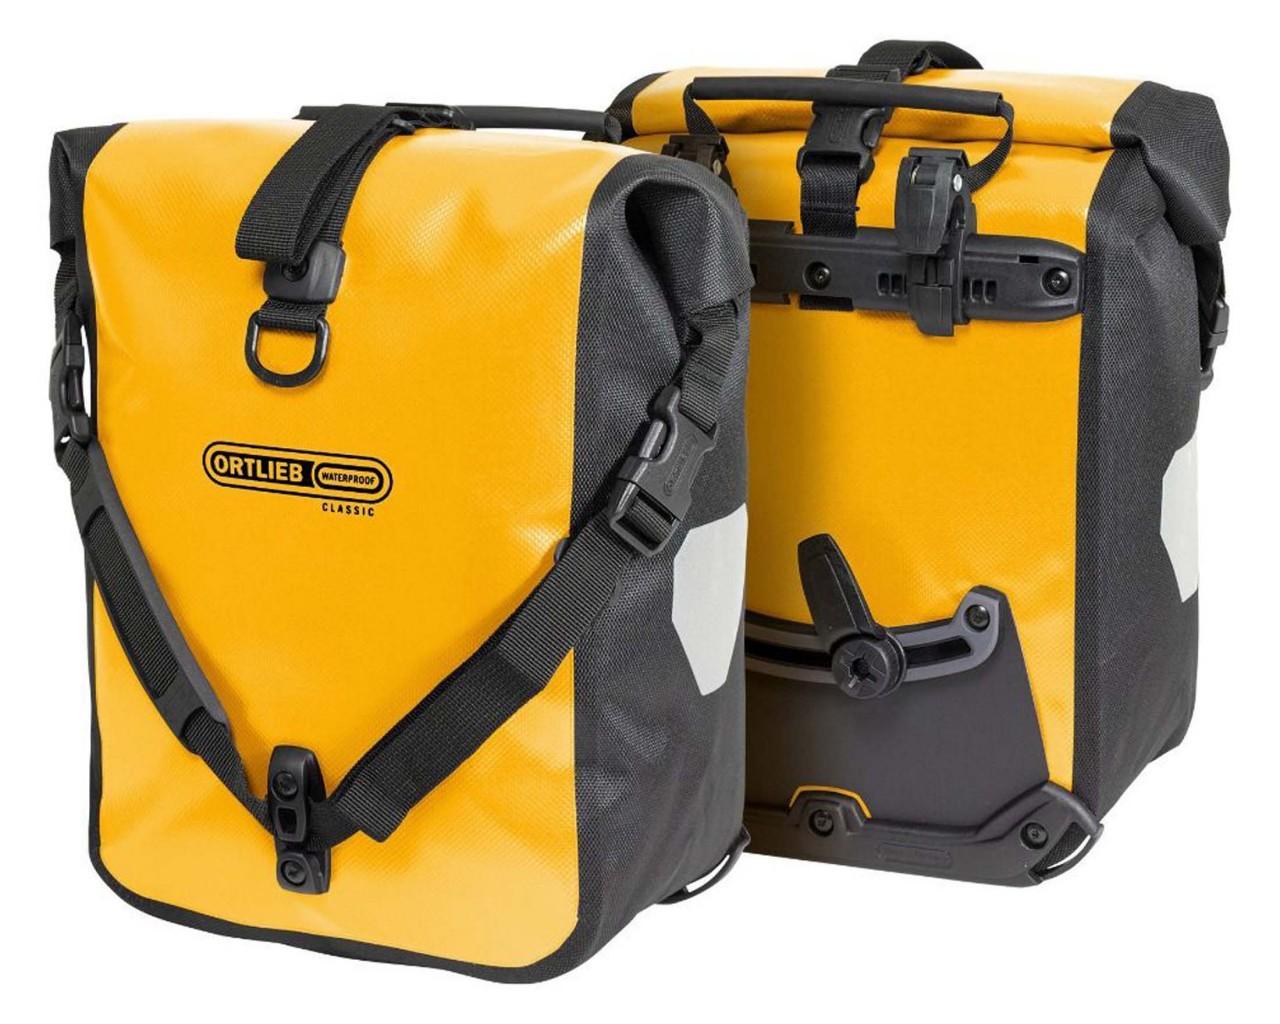 Ortlieb Sport-Roller Classic 2x 12 Liter wasserdichte Fahrradtaschen (Paar) | sun yellow-black